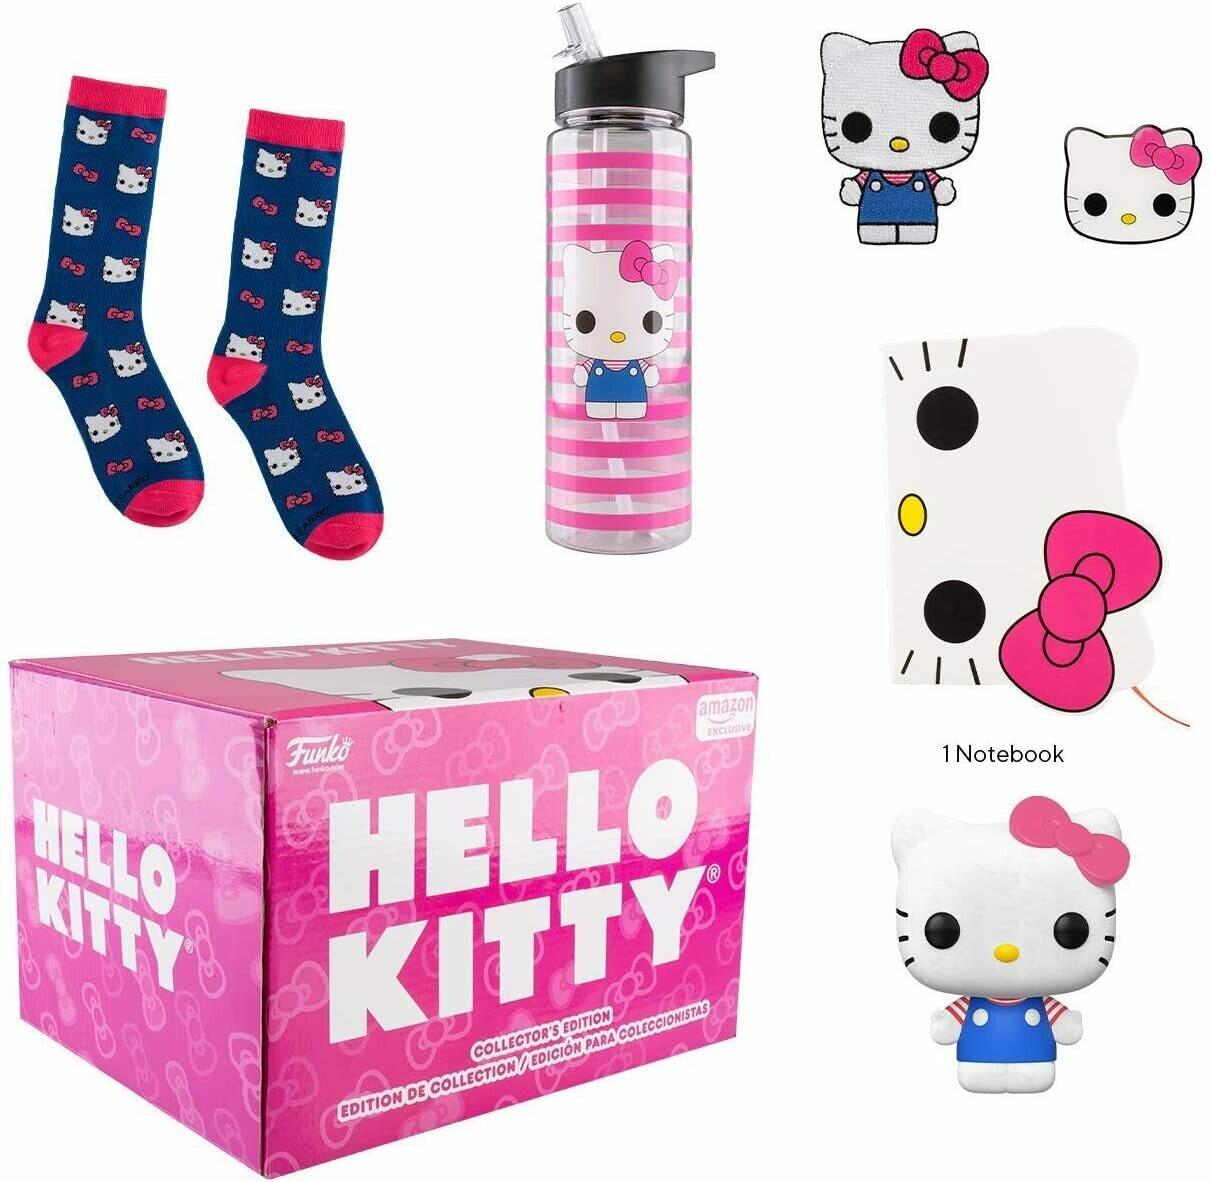 Funko Hello Kitty Pop Box